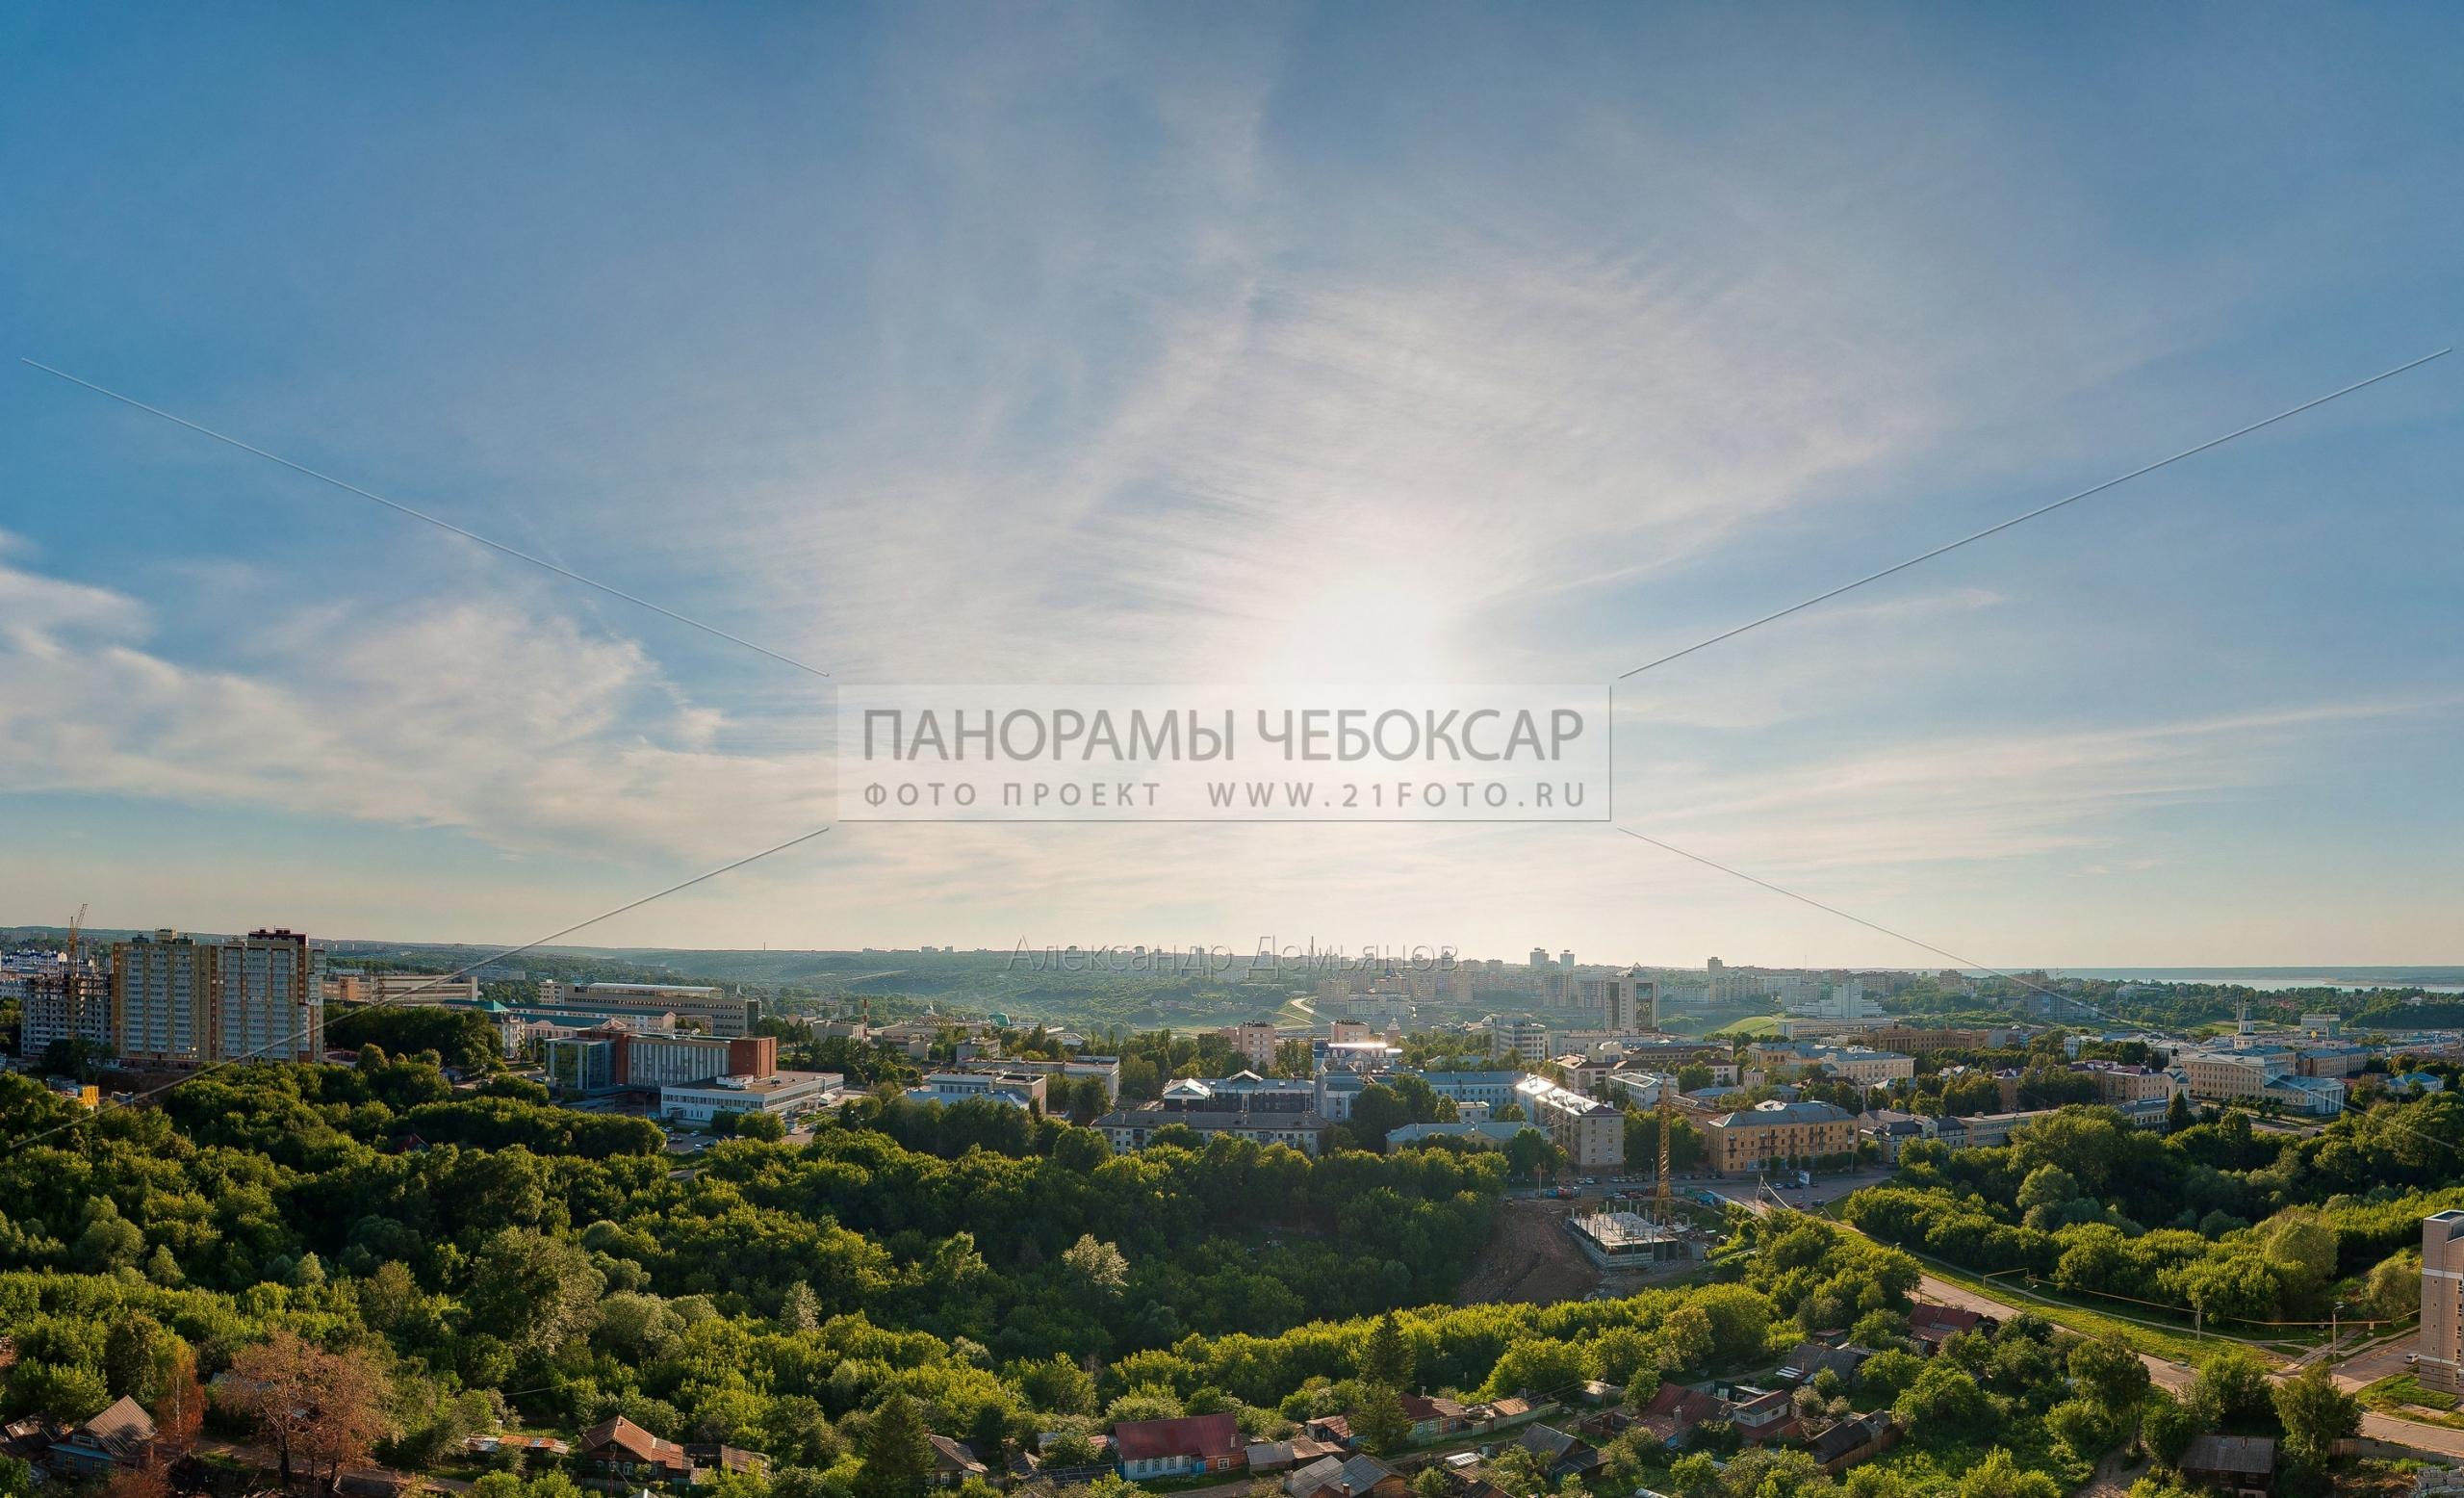 Центр города Чебоксары перед закатом